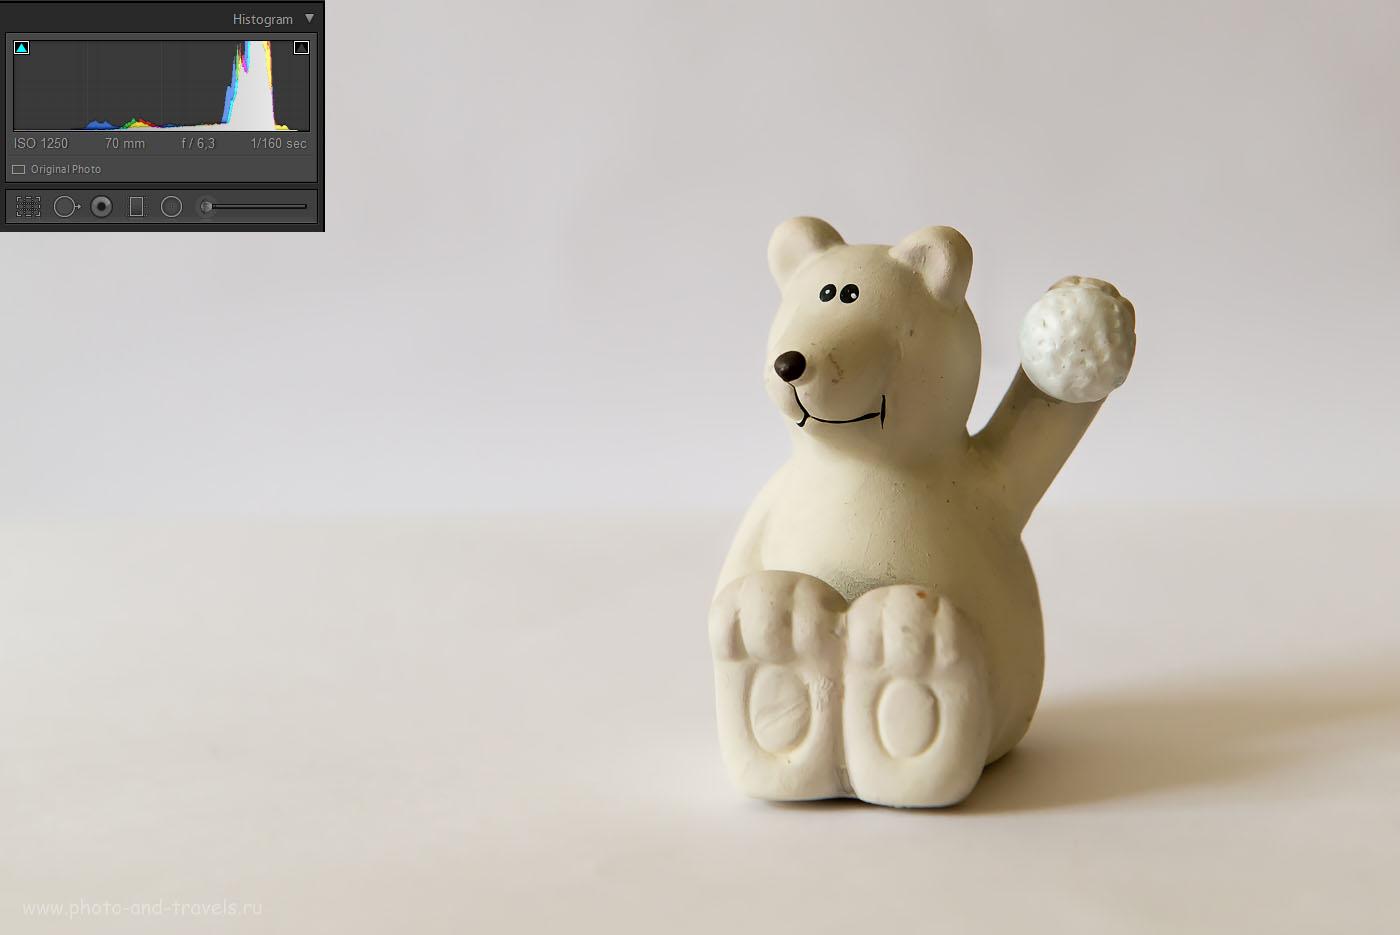 Фото 8. Белый медведь. Пример снимка, на котором гистограмма ушла вправо